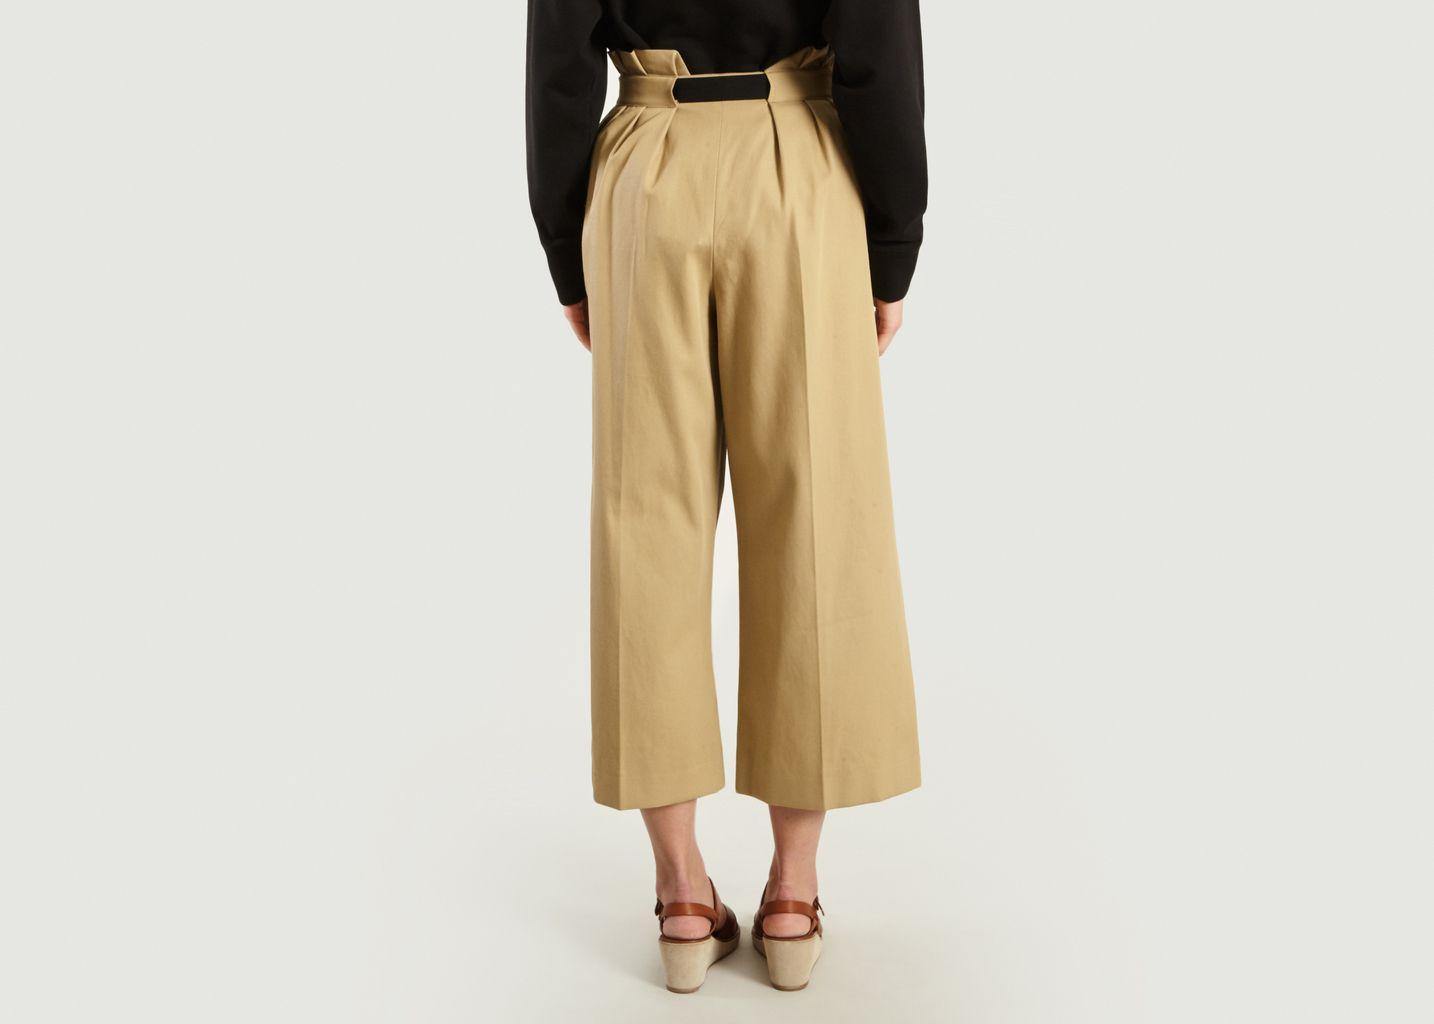 Pantalon Jupe-Culotte - Kenzo